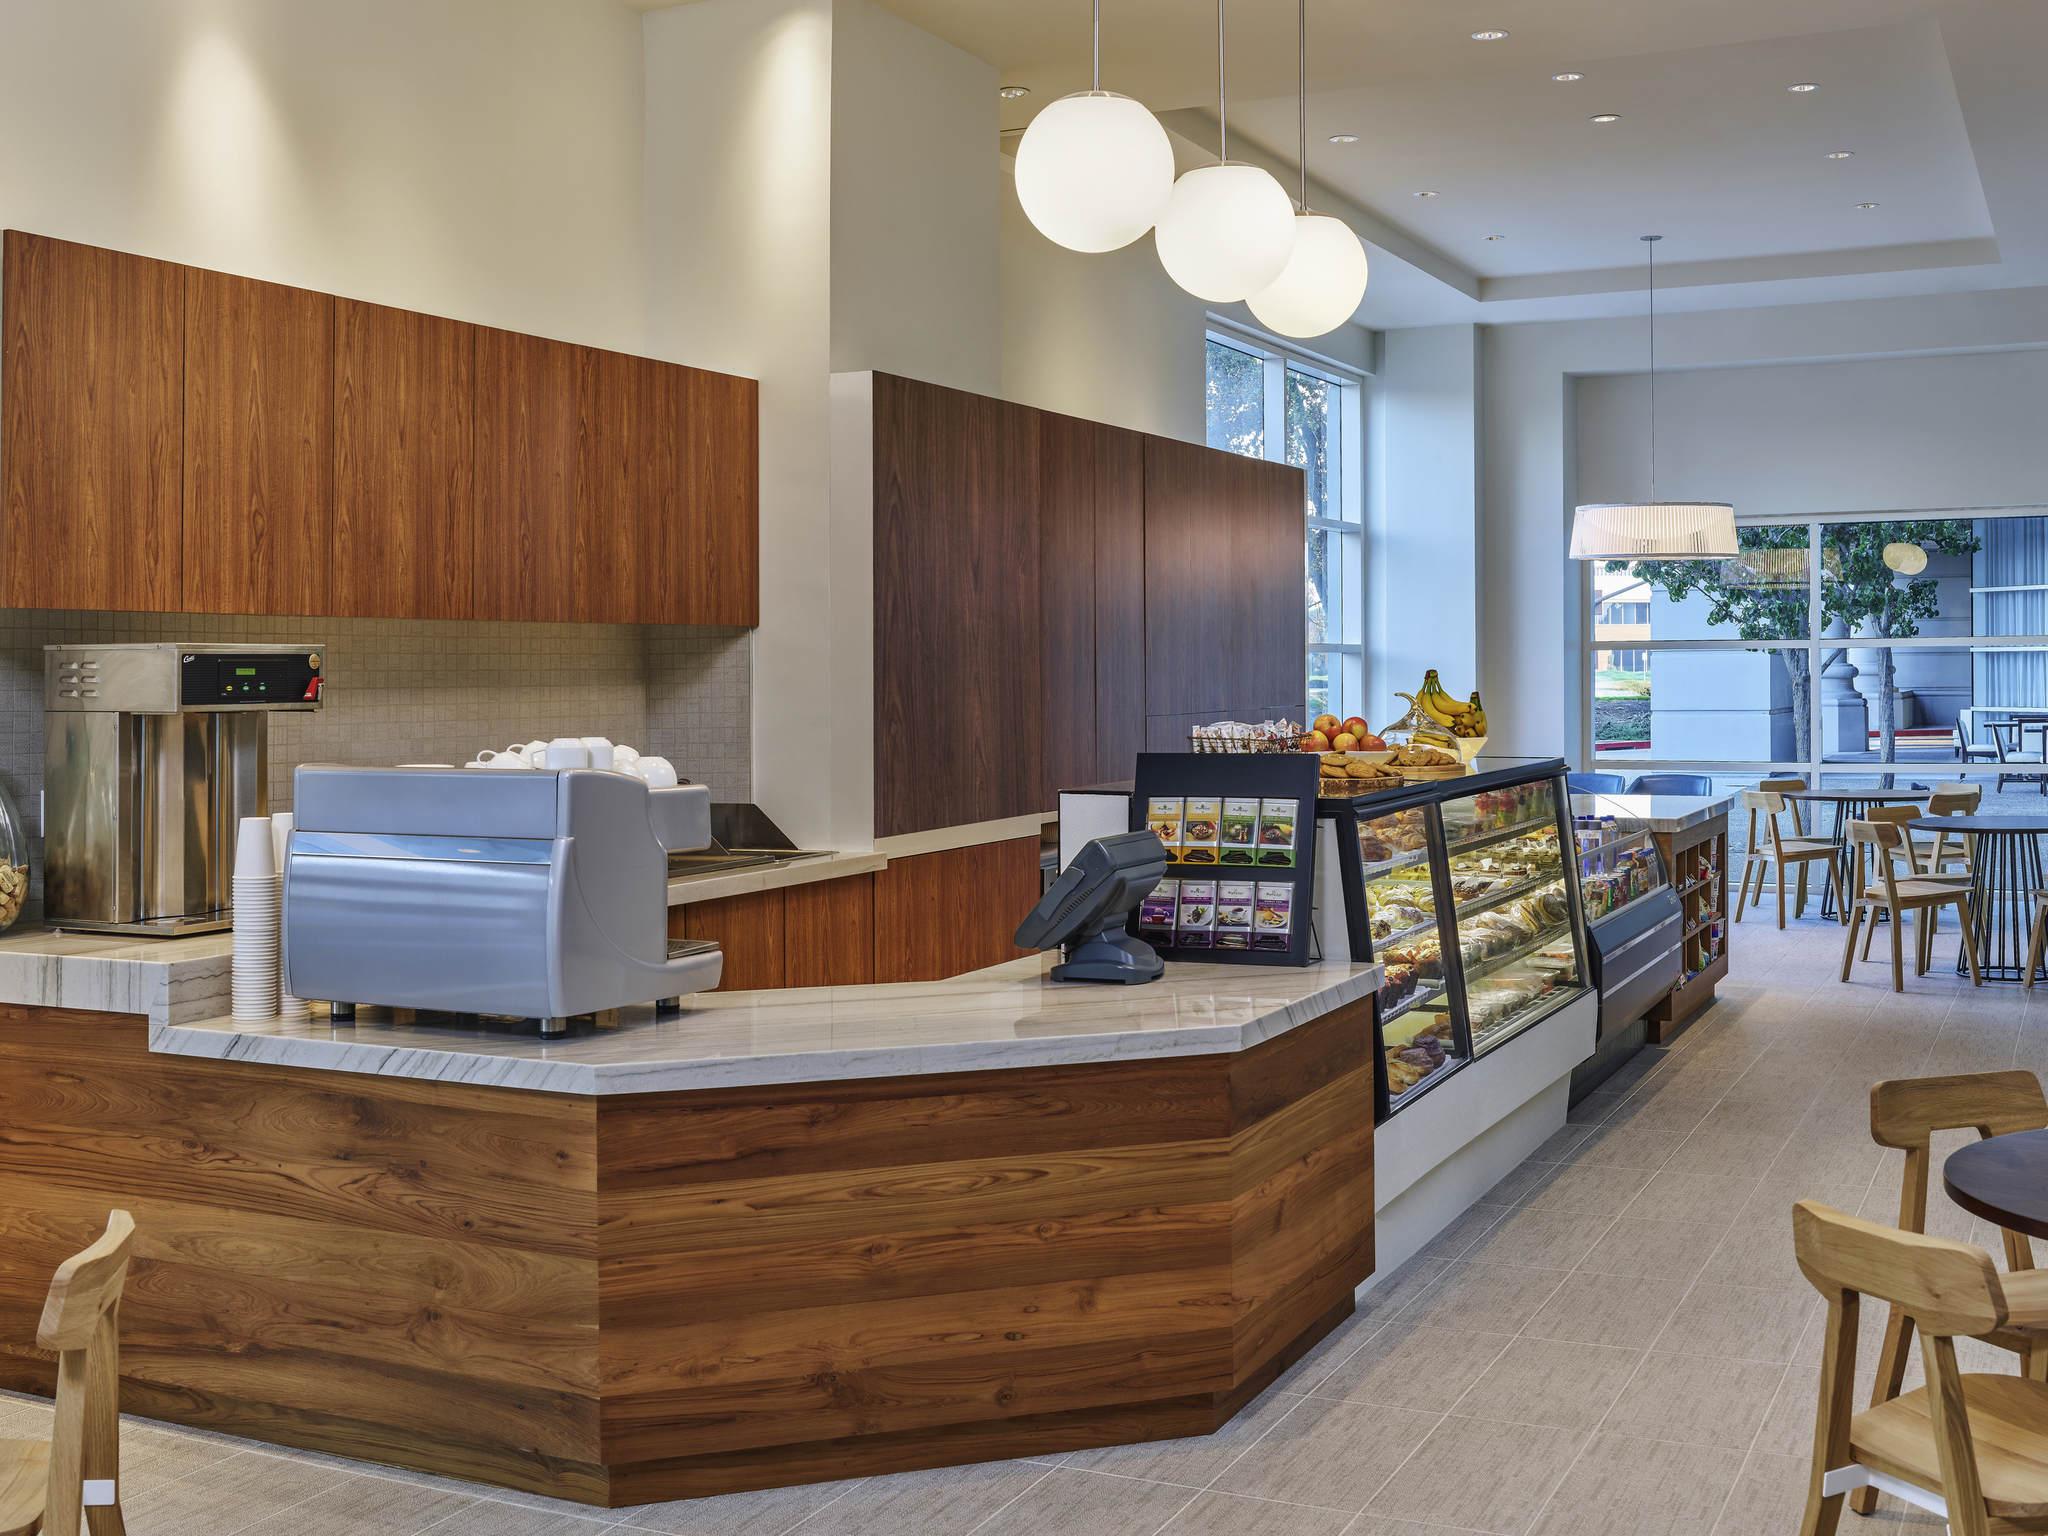 Hotel Sofitel Redwood Shores Restaurant